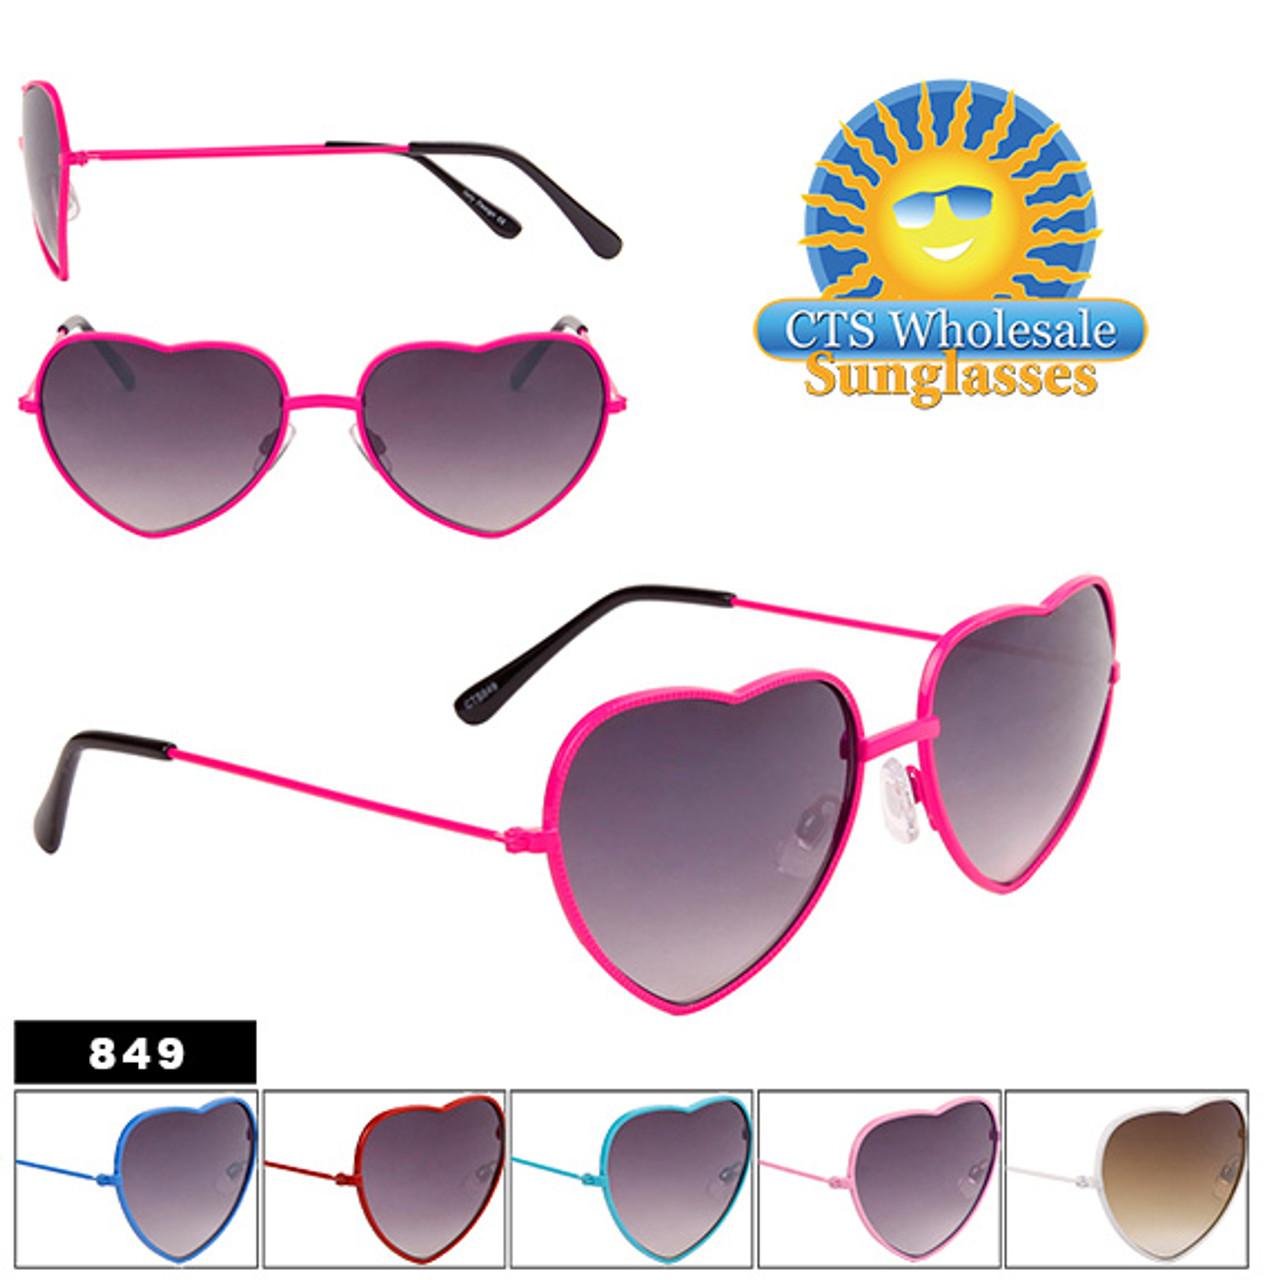 Wholesale Heart Sunglasses - Style #849